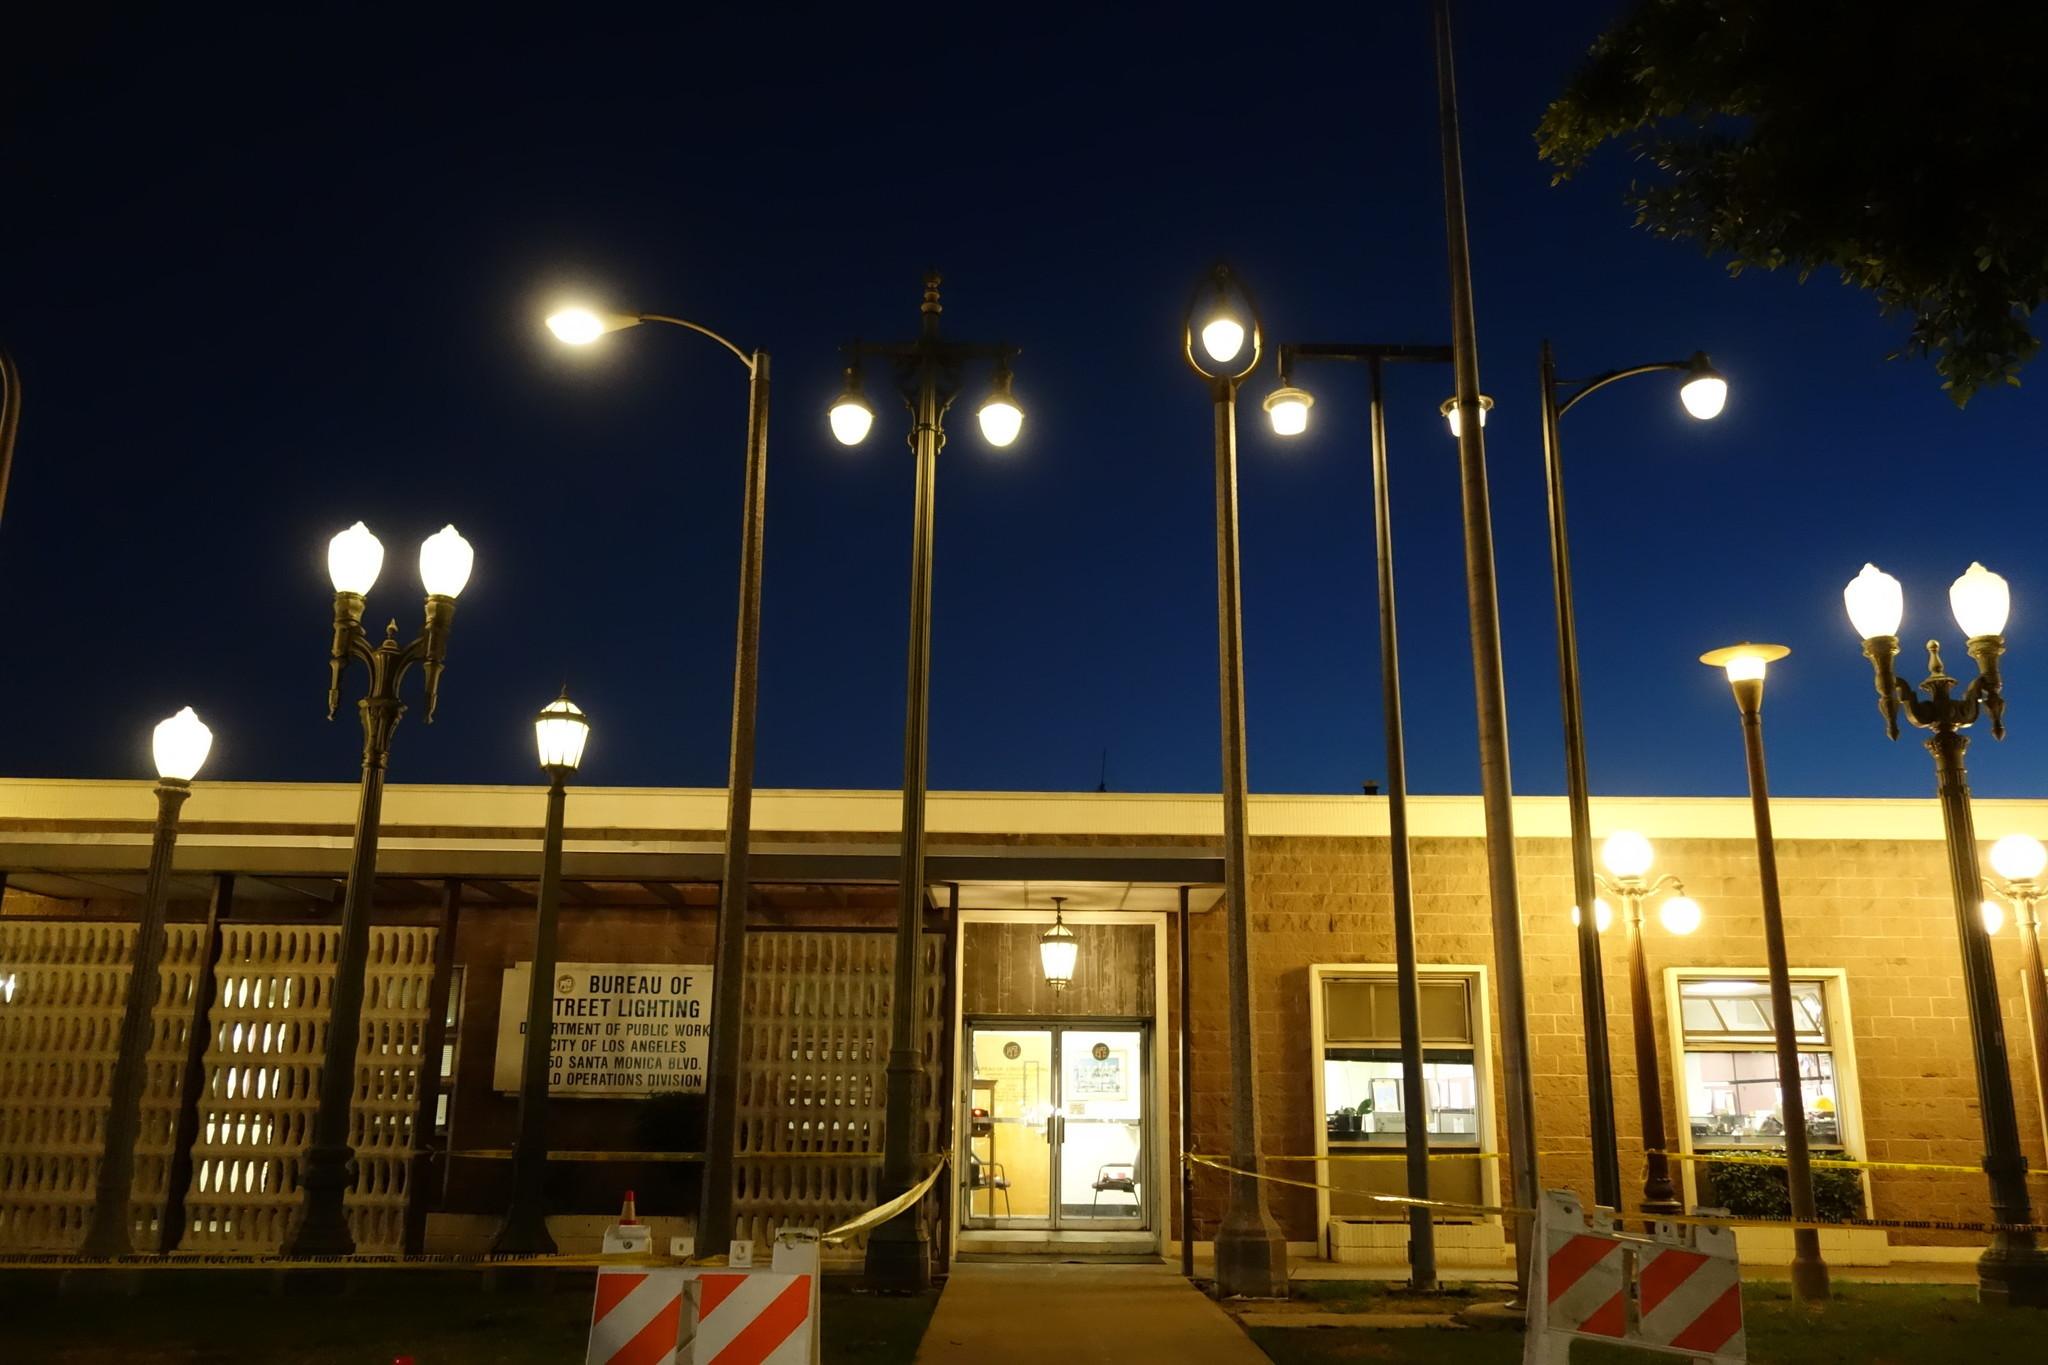 Bureau of Street Lighting